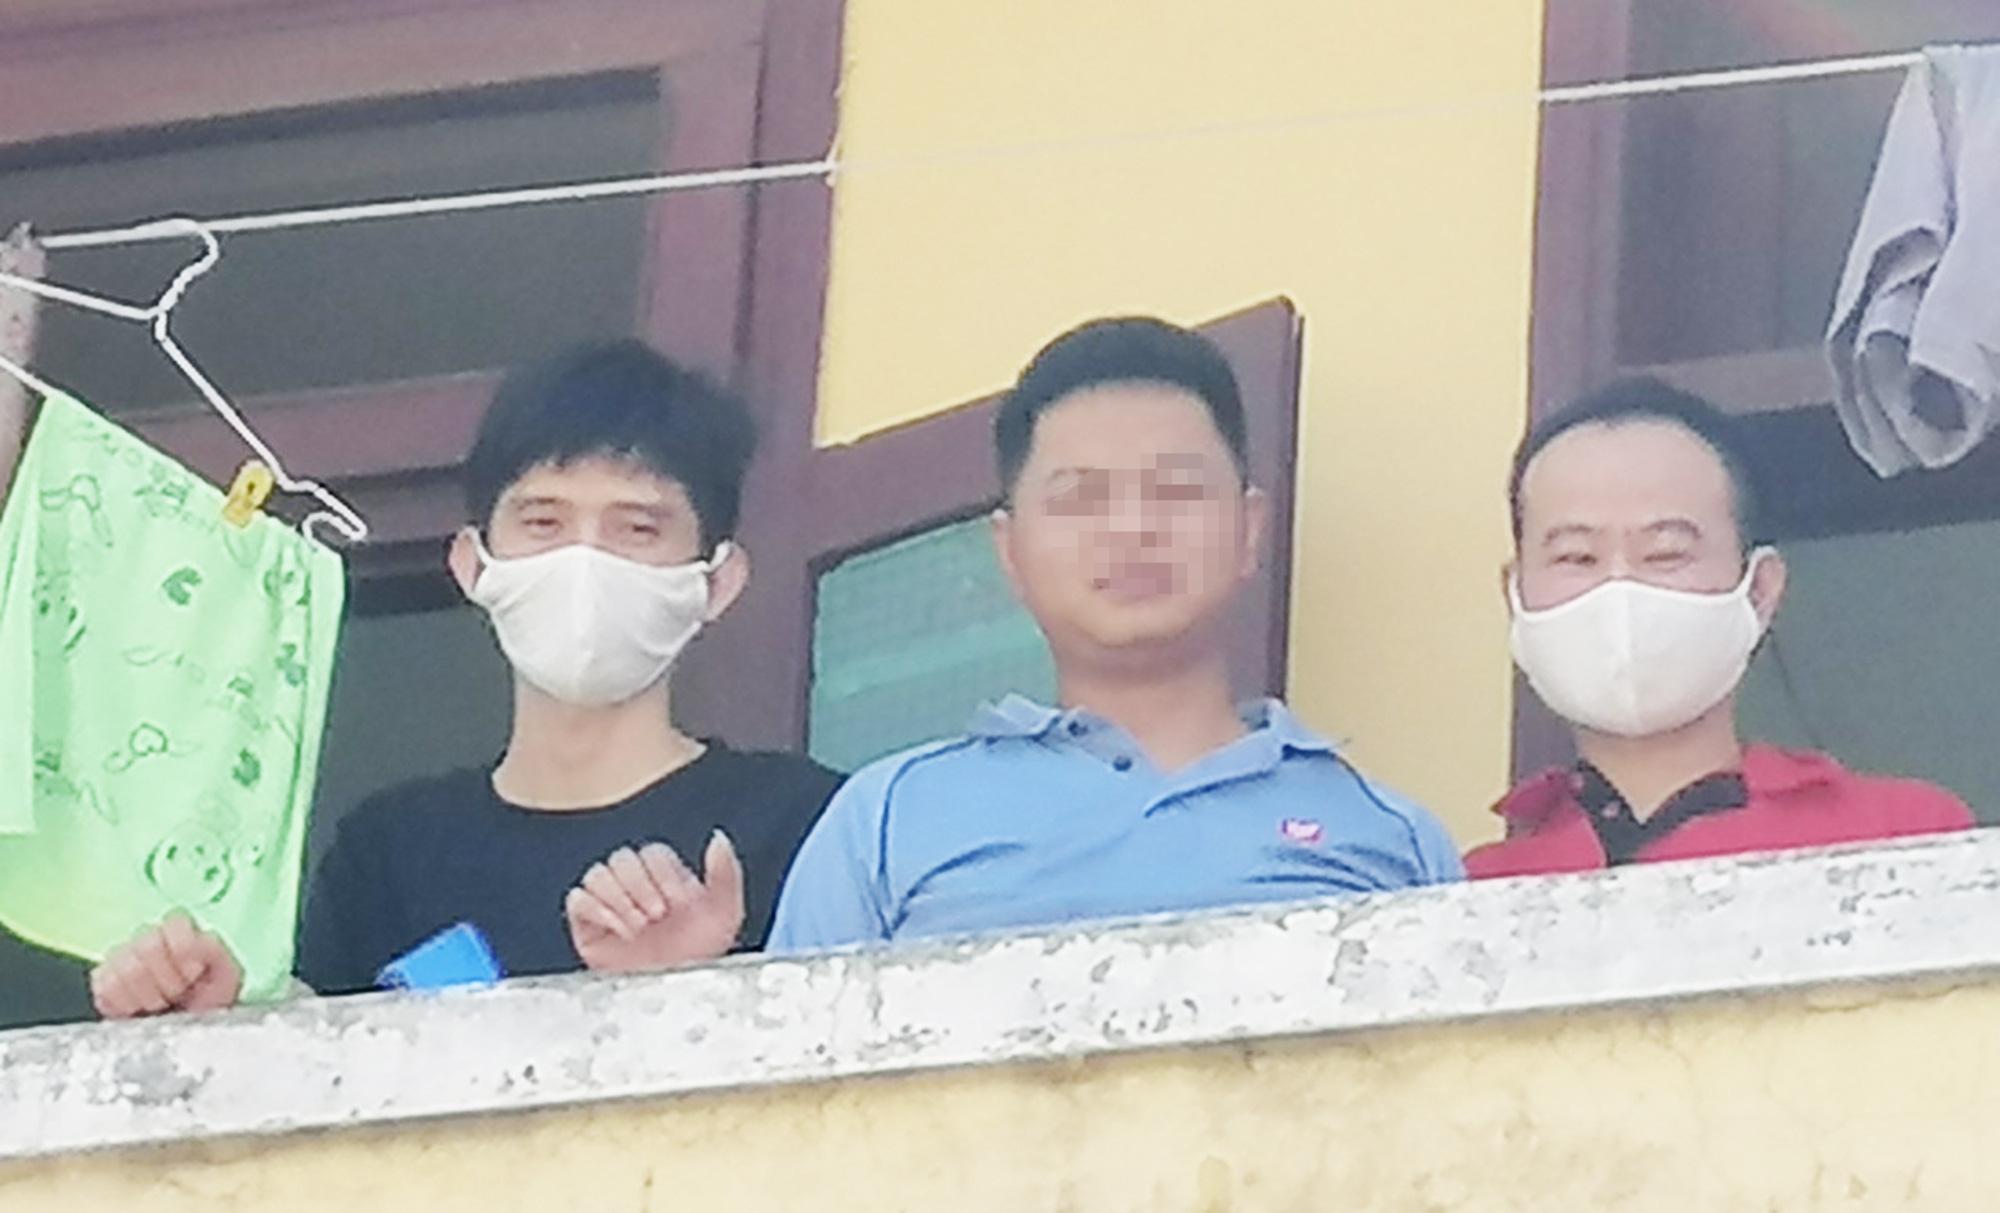 24 Chinese quarantined following hotel inspection in Da Nang